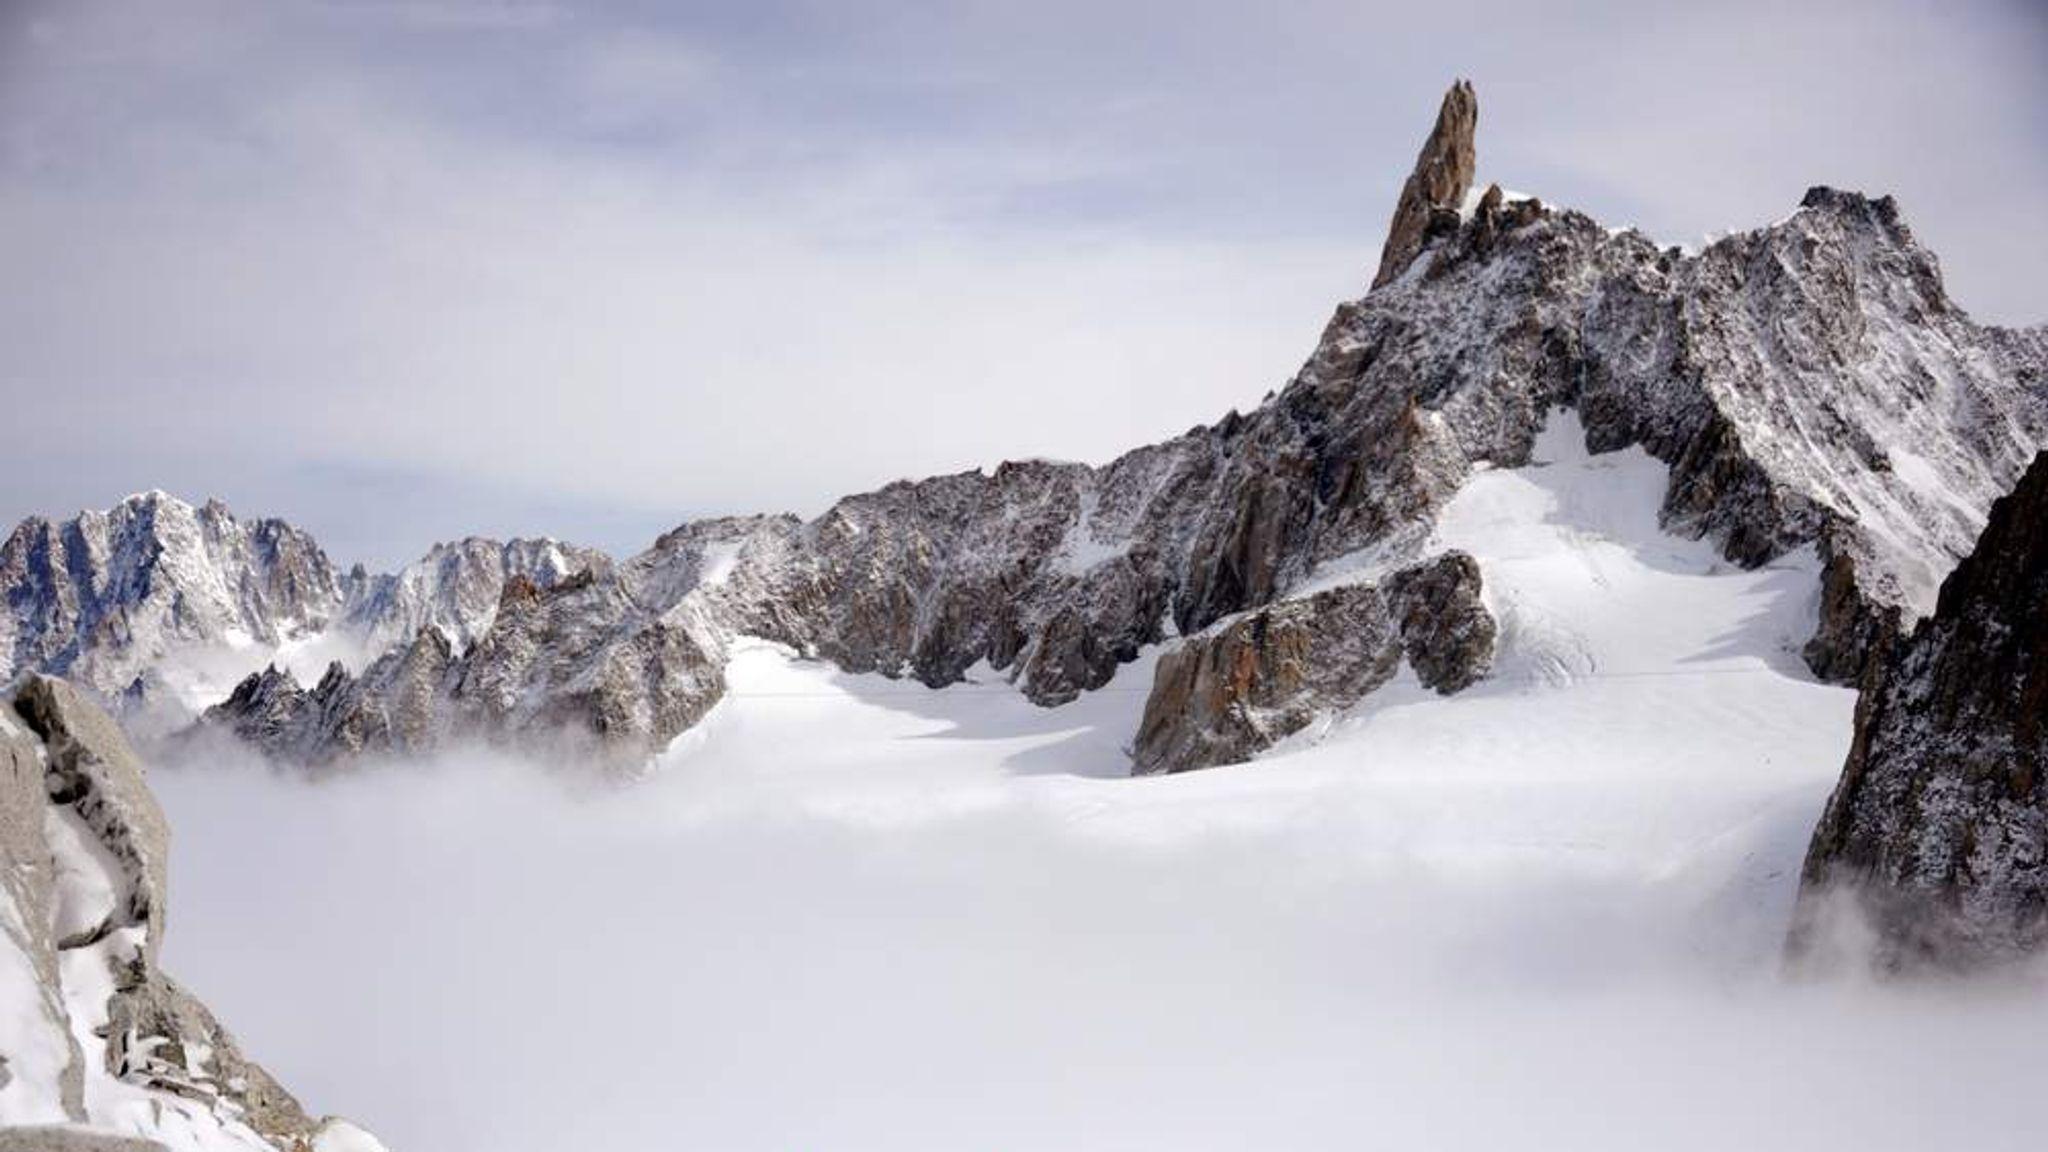 Two Irish Climbers Killed In Mont Blanc Fall World News